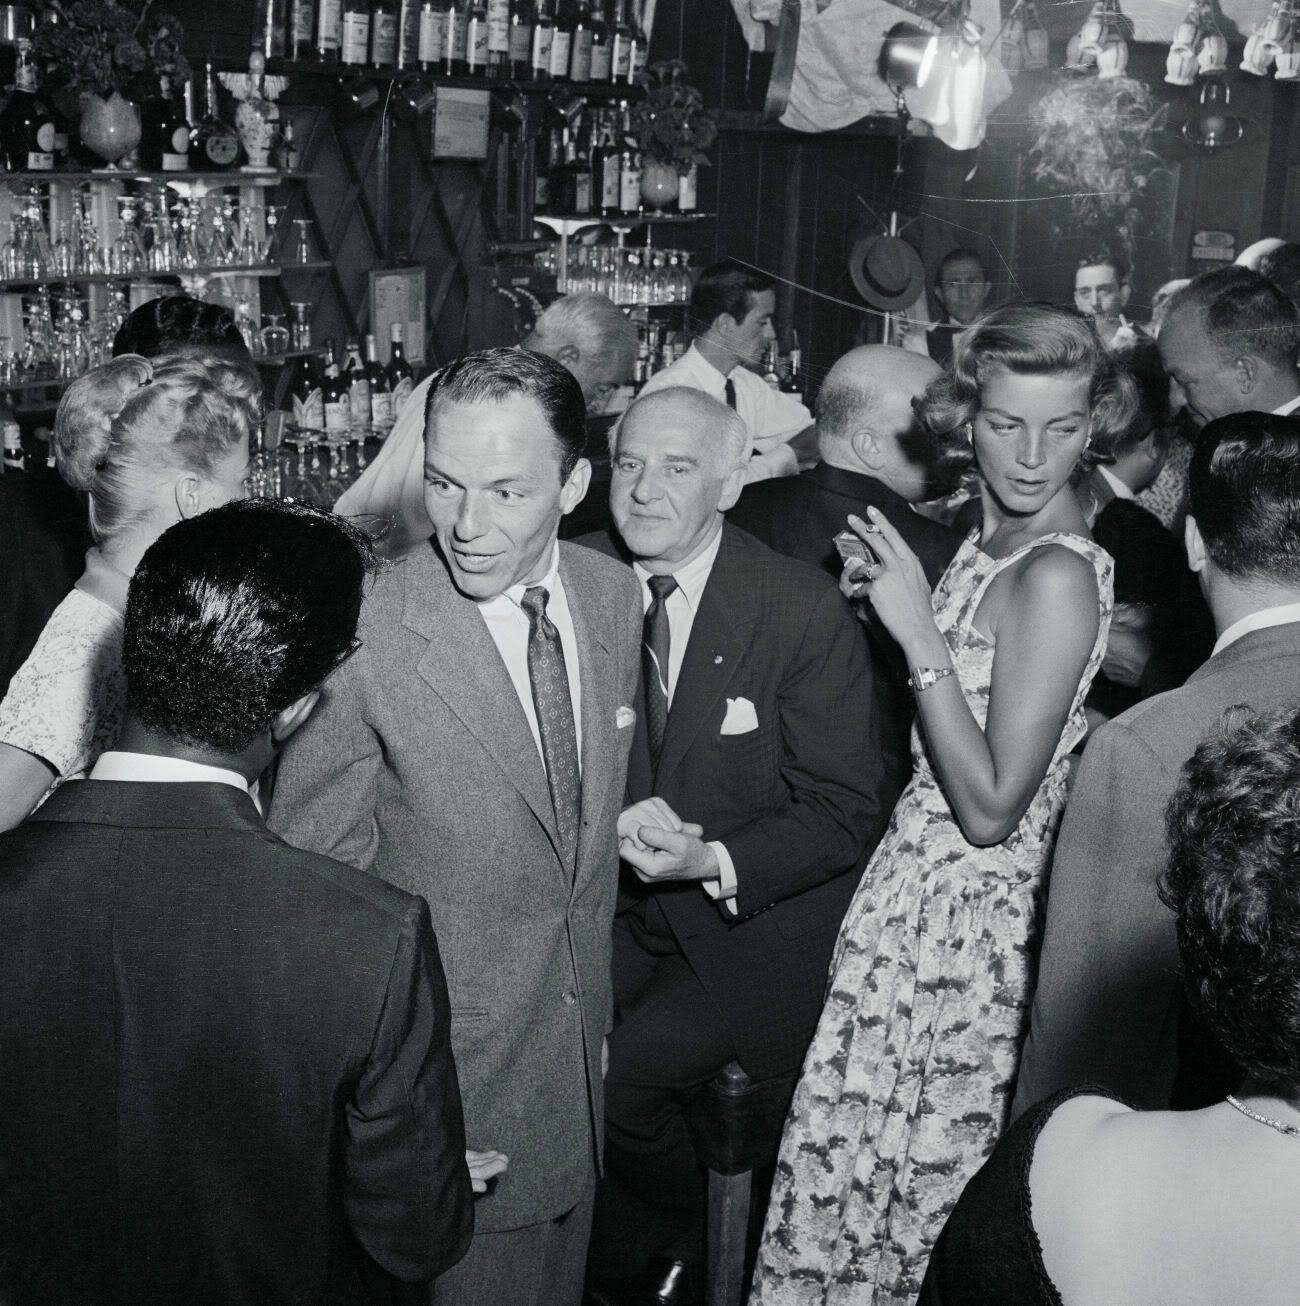 Frank Sinatra, Sam Giancana and Lauren Bacall, 1957 | The Brat Pack